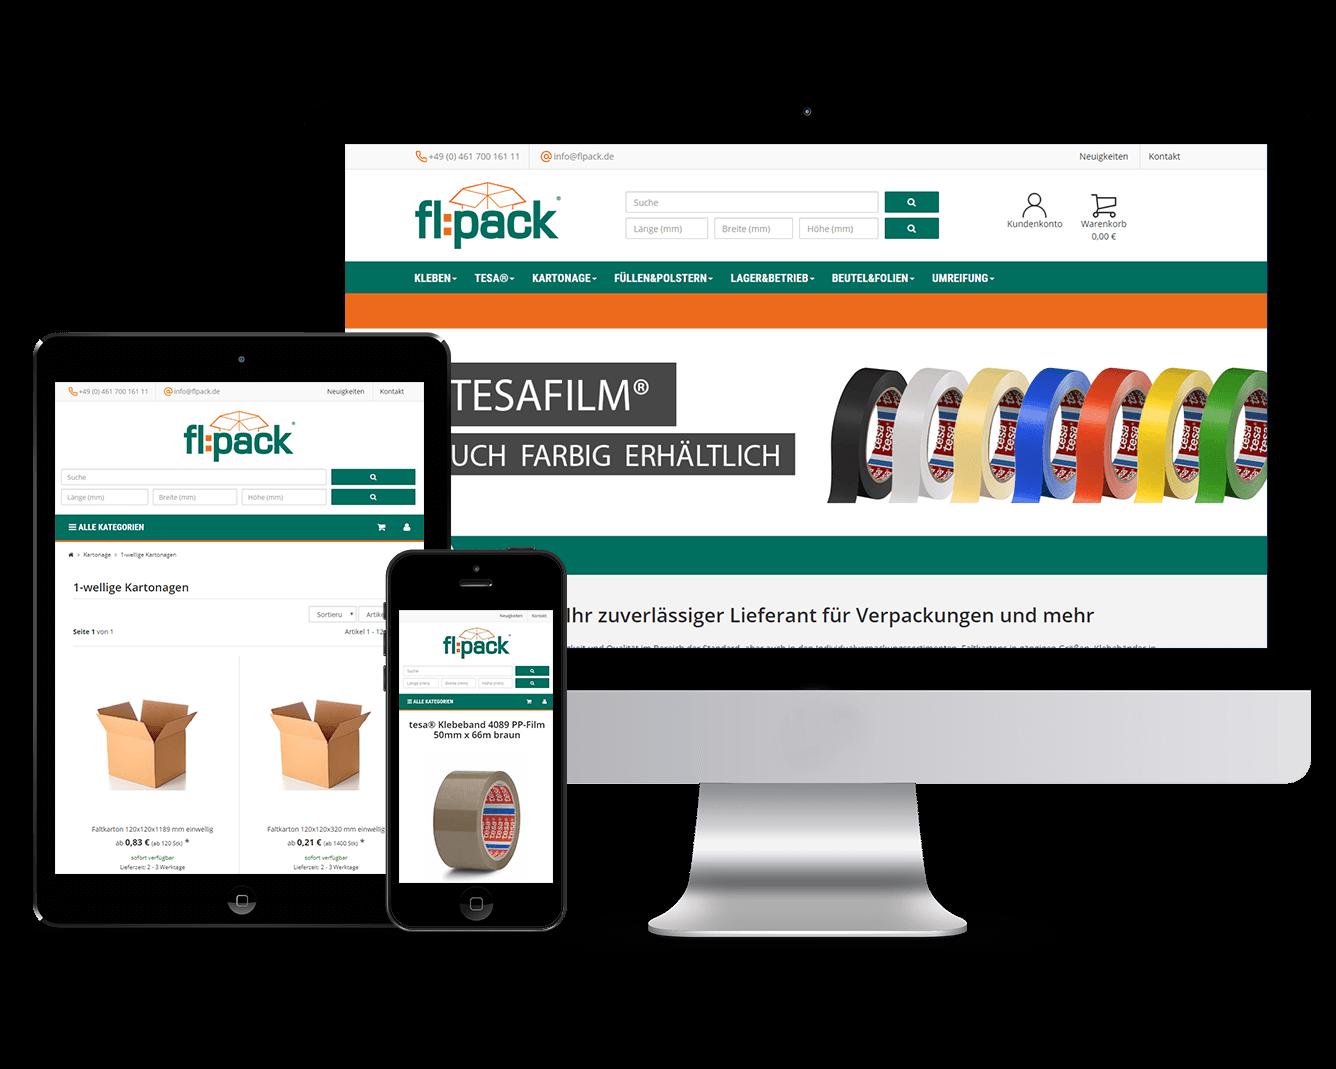 fl:pack GmbH